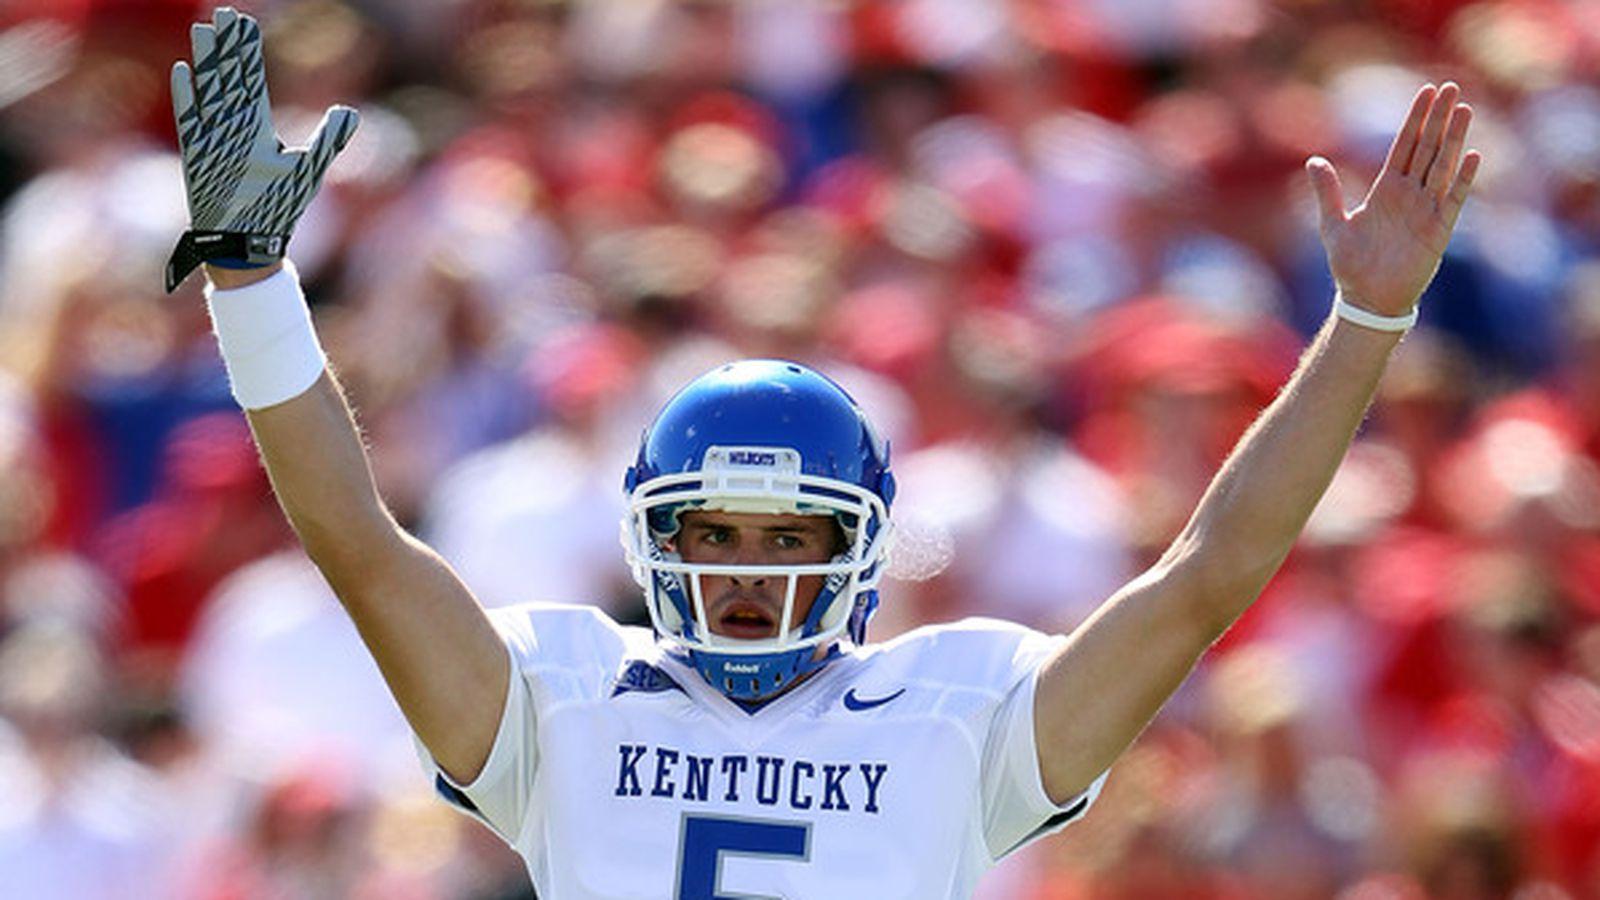 Kentucky Basketball Named Preseason Favorite For Sec Crown: Kentucky Football: Successful Quarterbacks Don't Translate